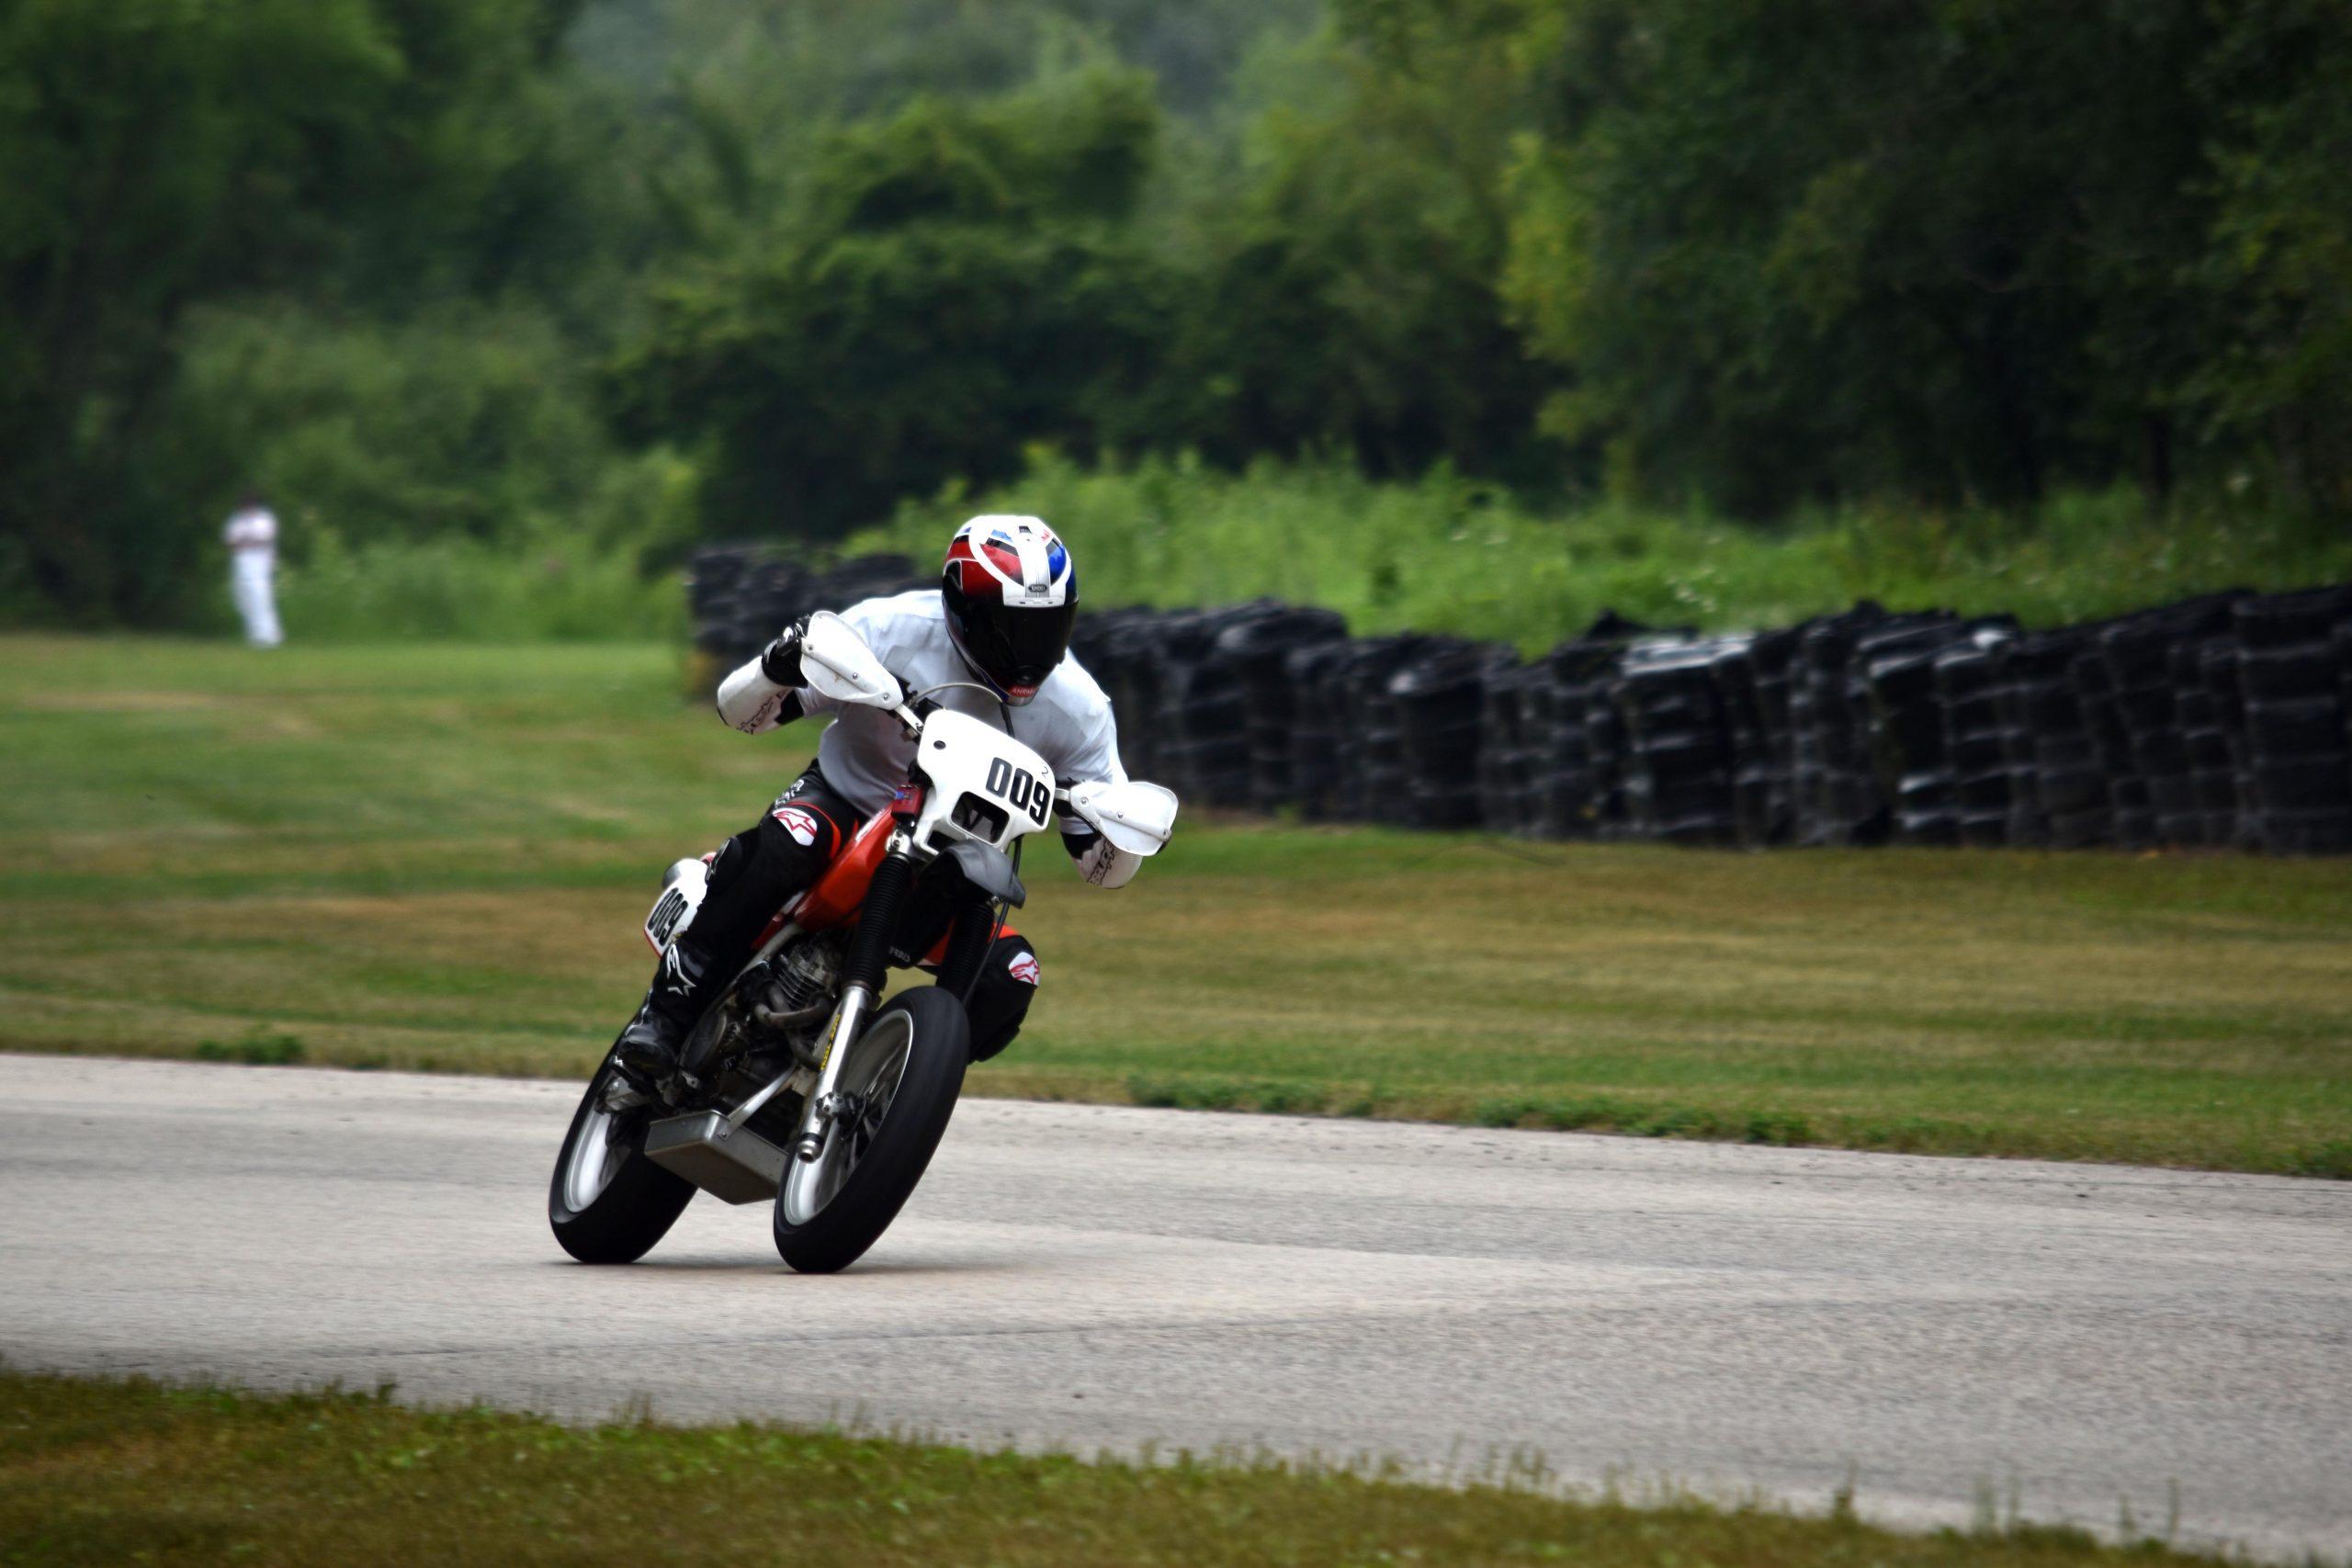 Honda XR250 on track Blackhawk Farms